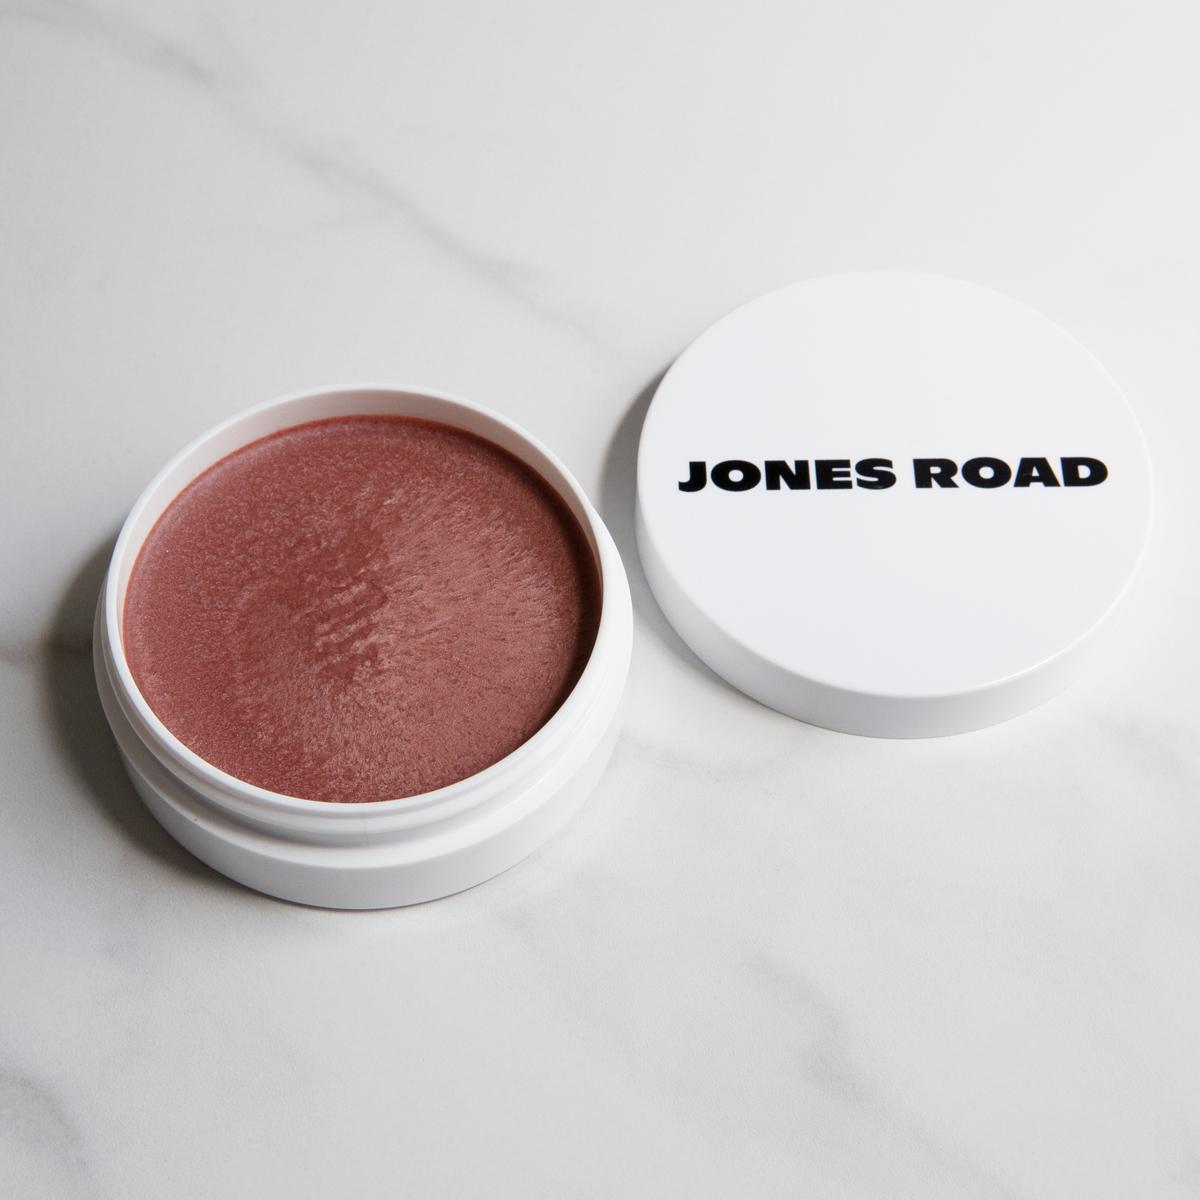 Jones Road Miracle Balm Dusty Rose